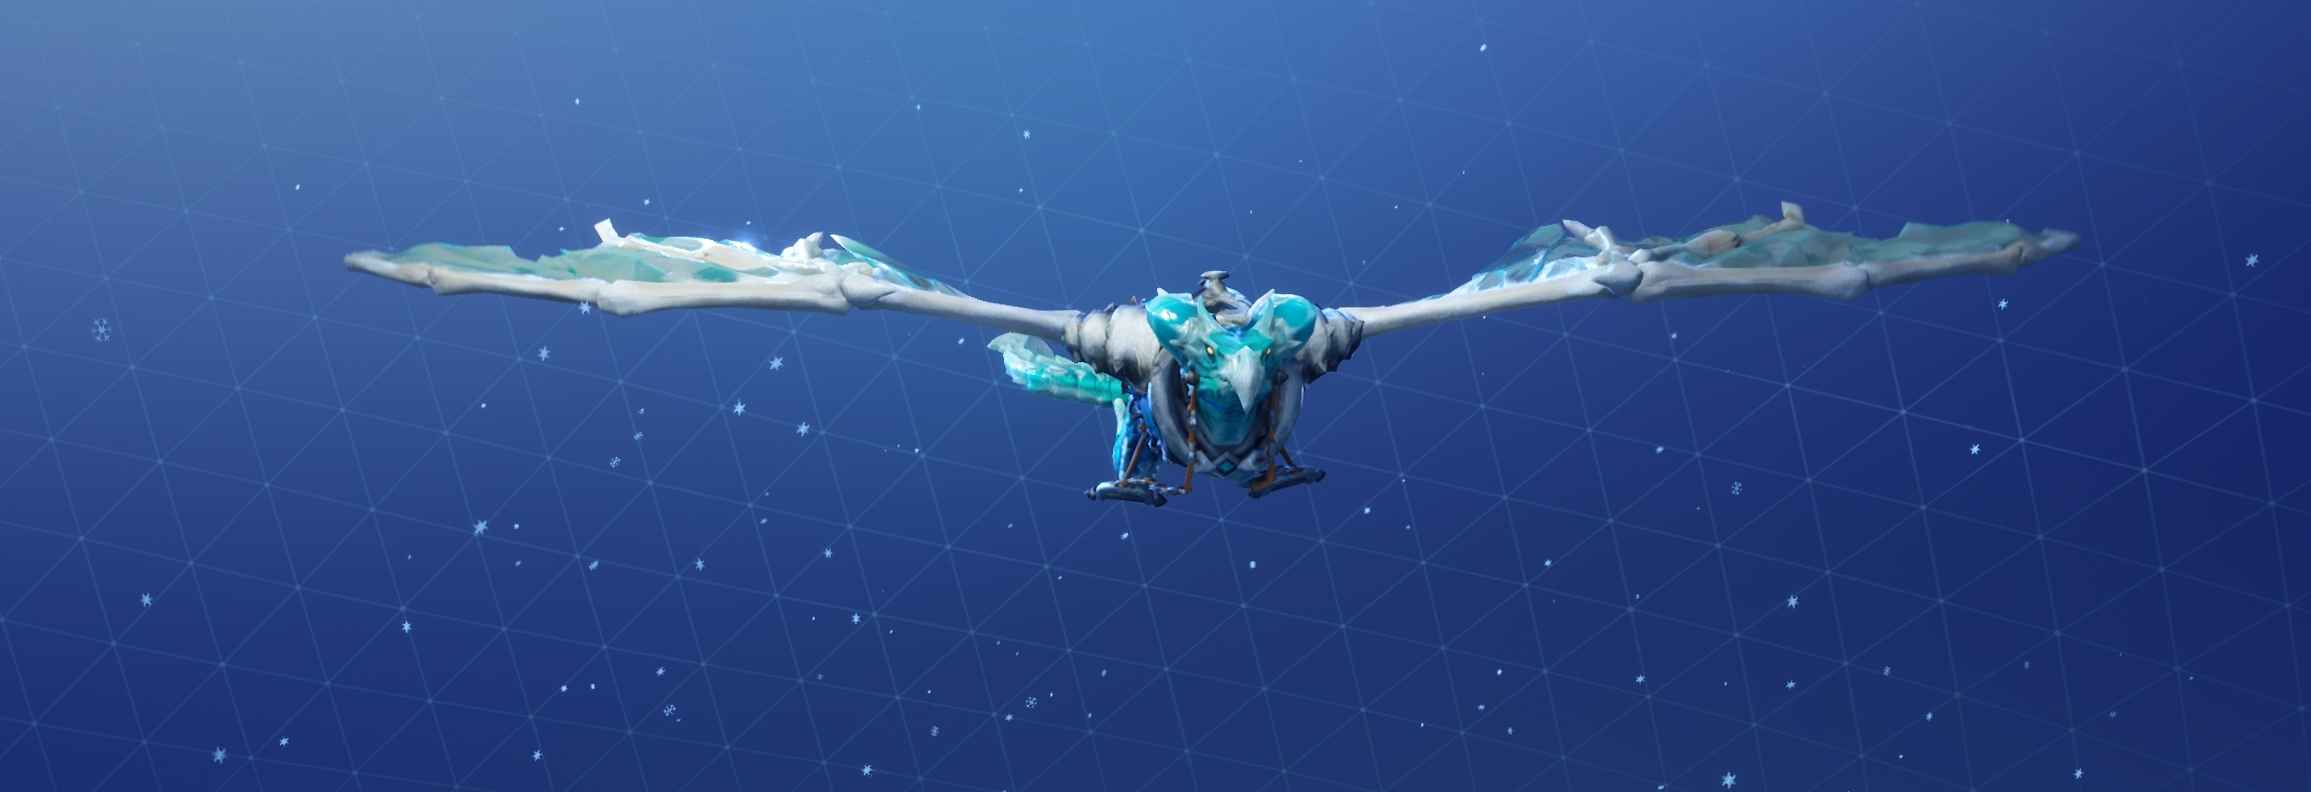 gallery - fortnite ice dragon glider